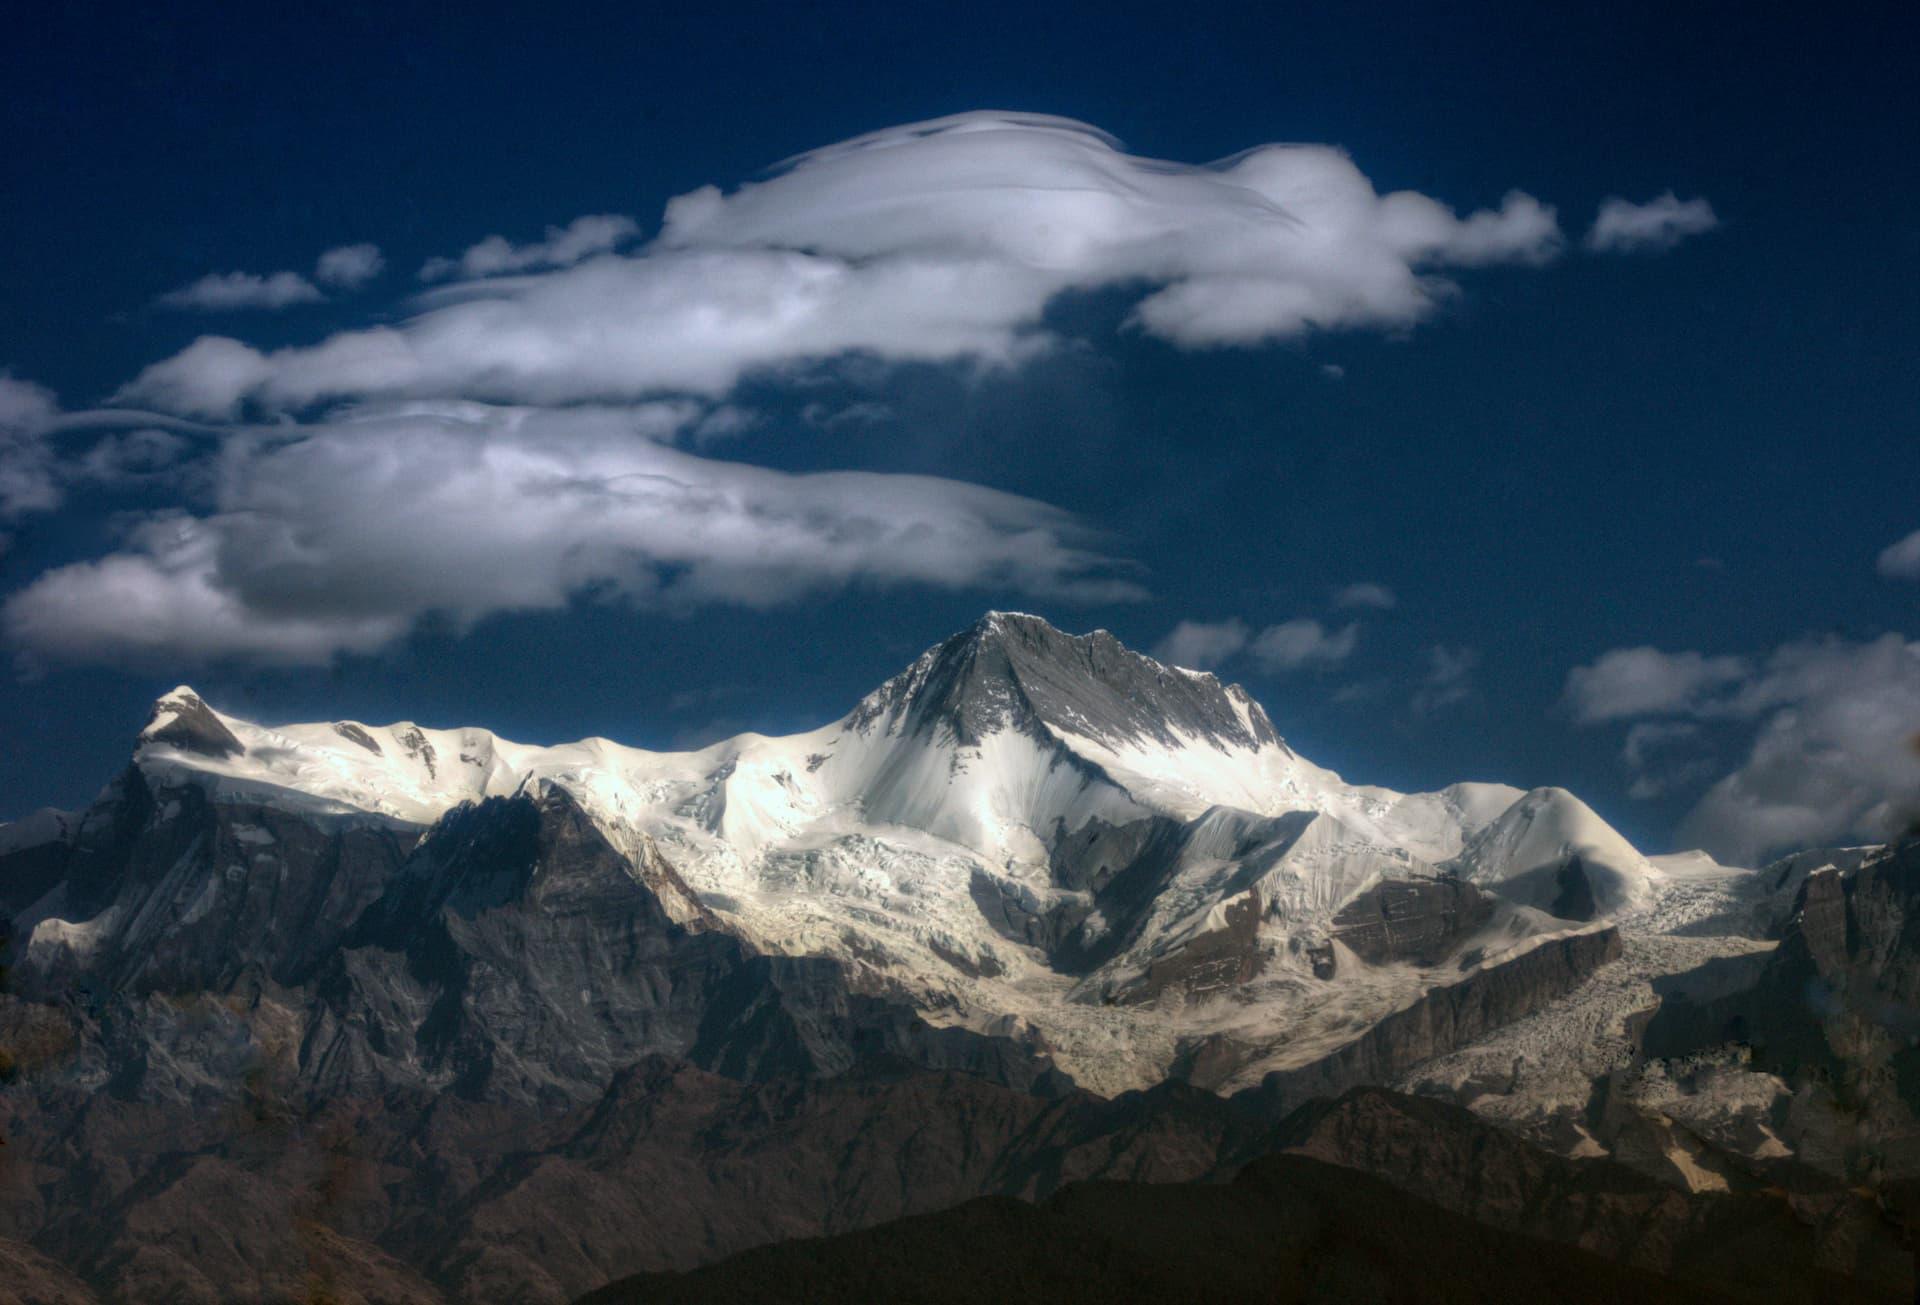 Locul 10 cei mai înalți munți - Annapurna